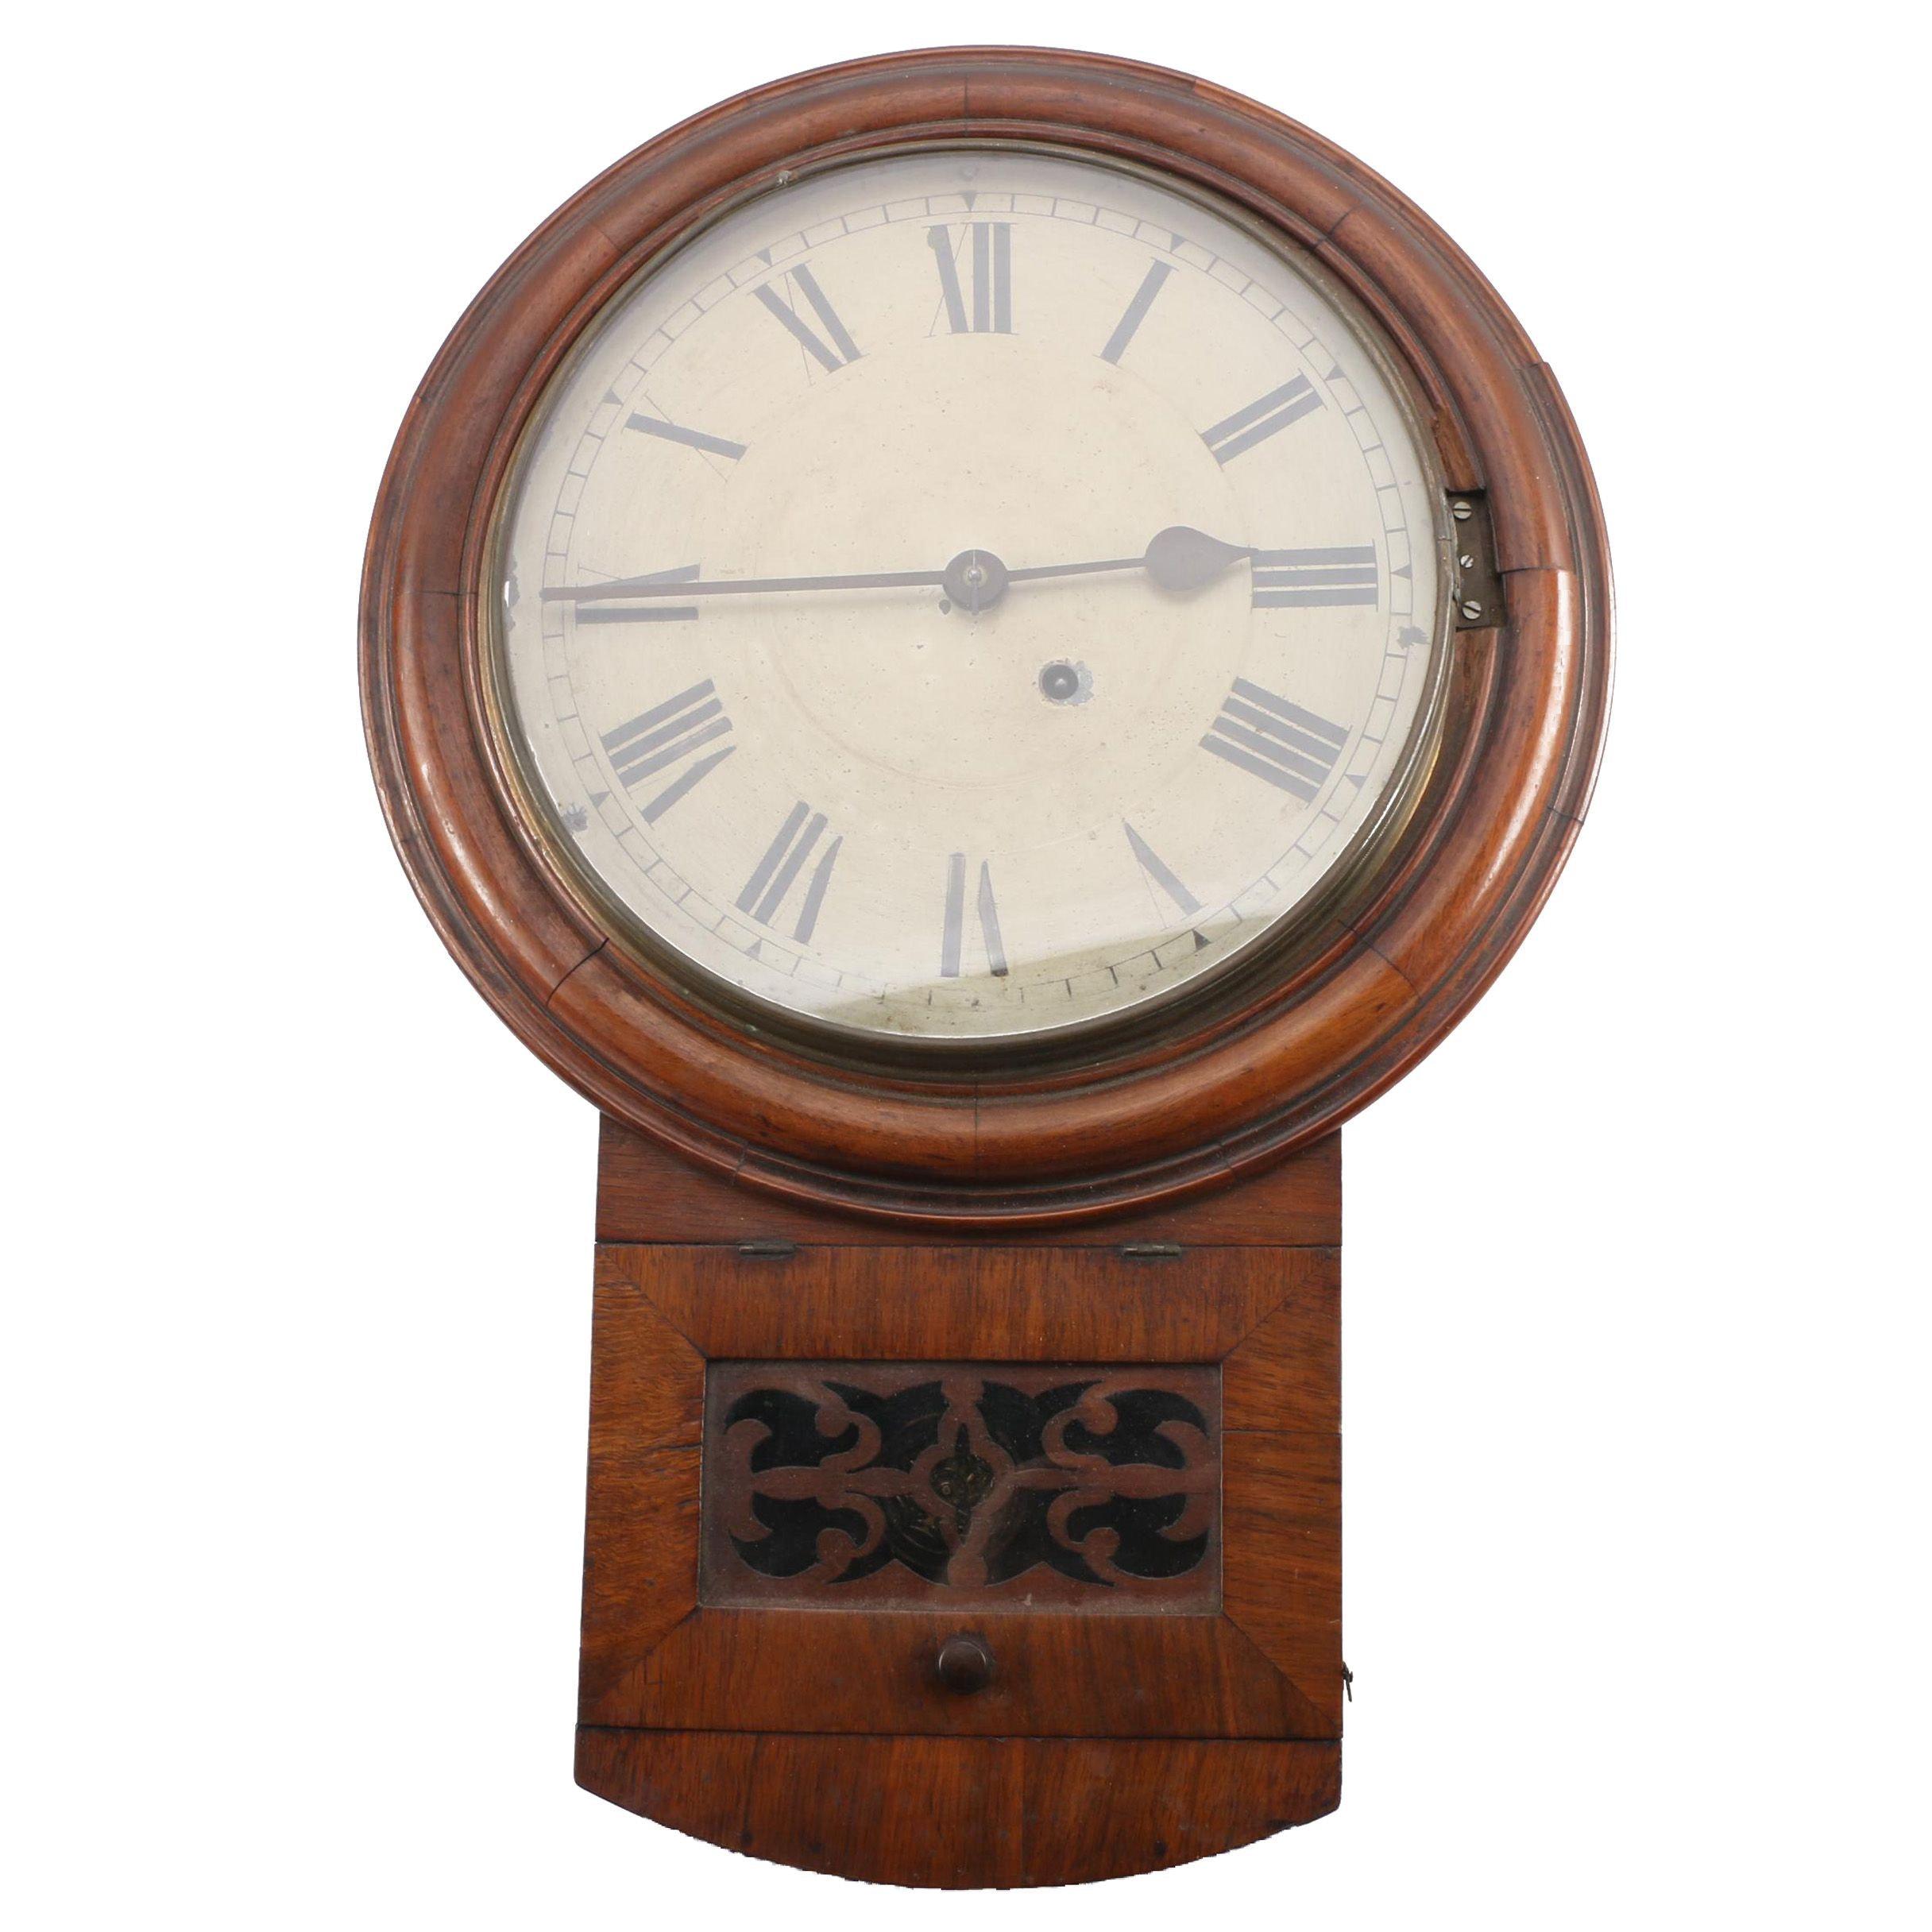 Antique Ganter Bros. Wall Clock